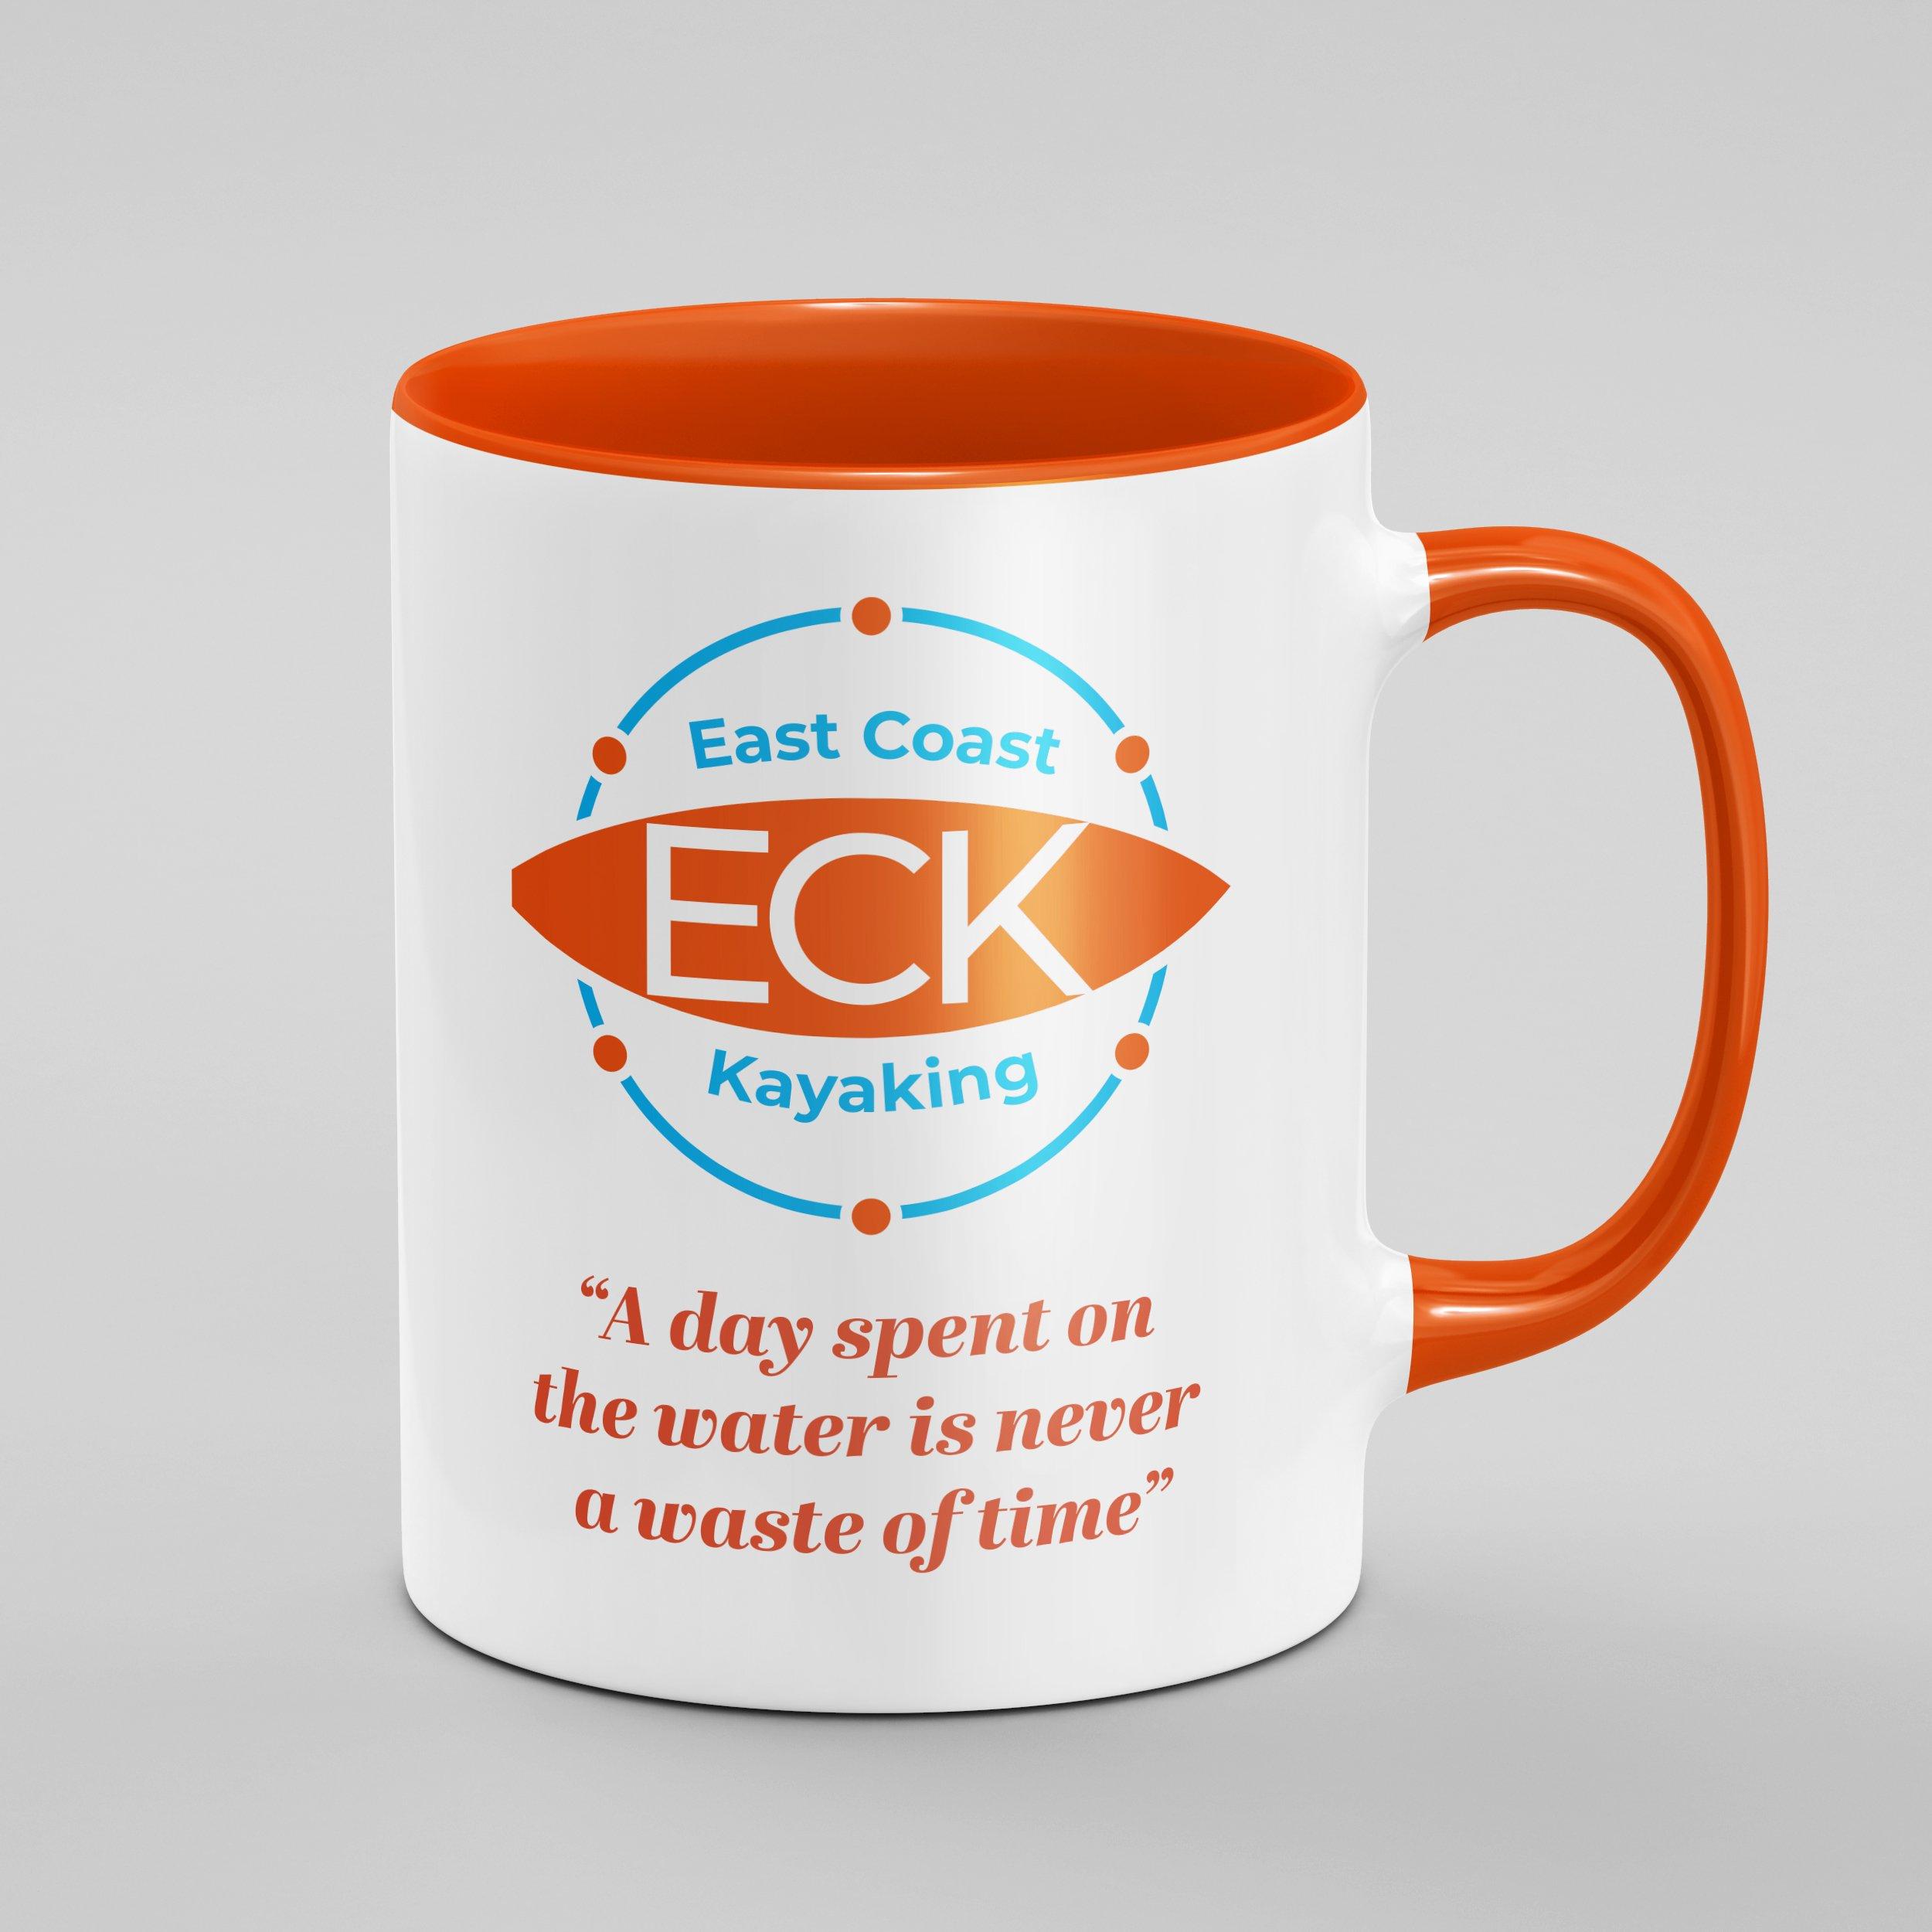 11oz Inner Handle Mug Corporate Gift Idea